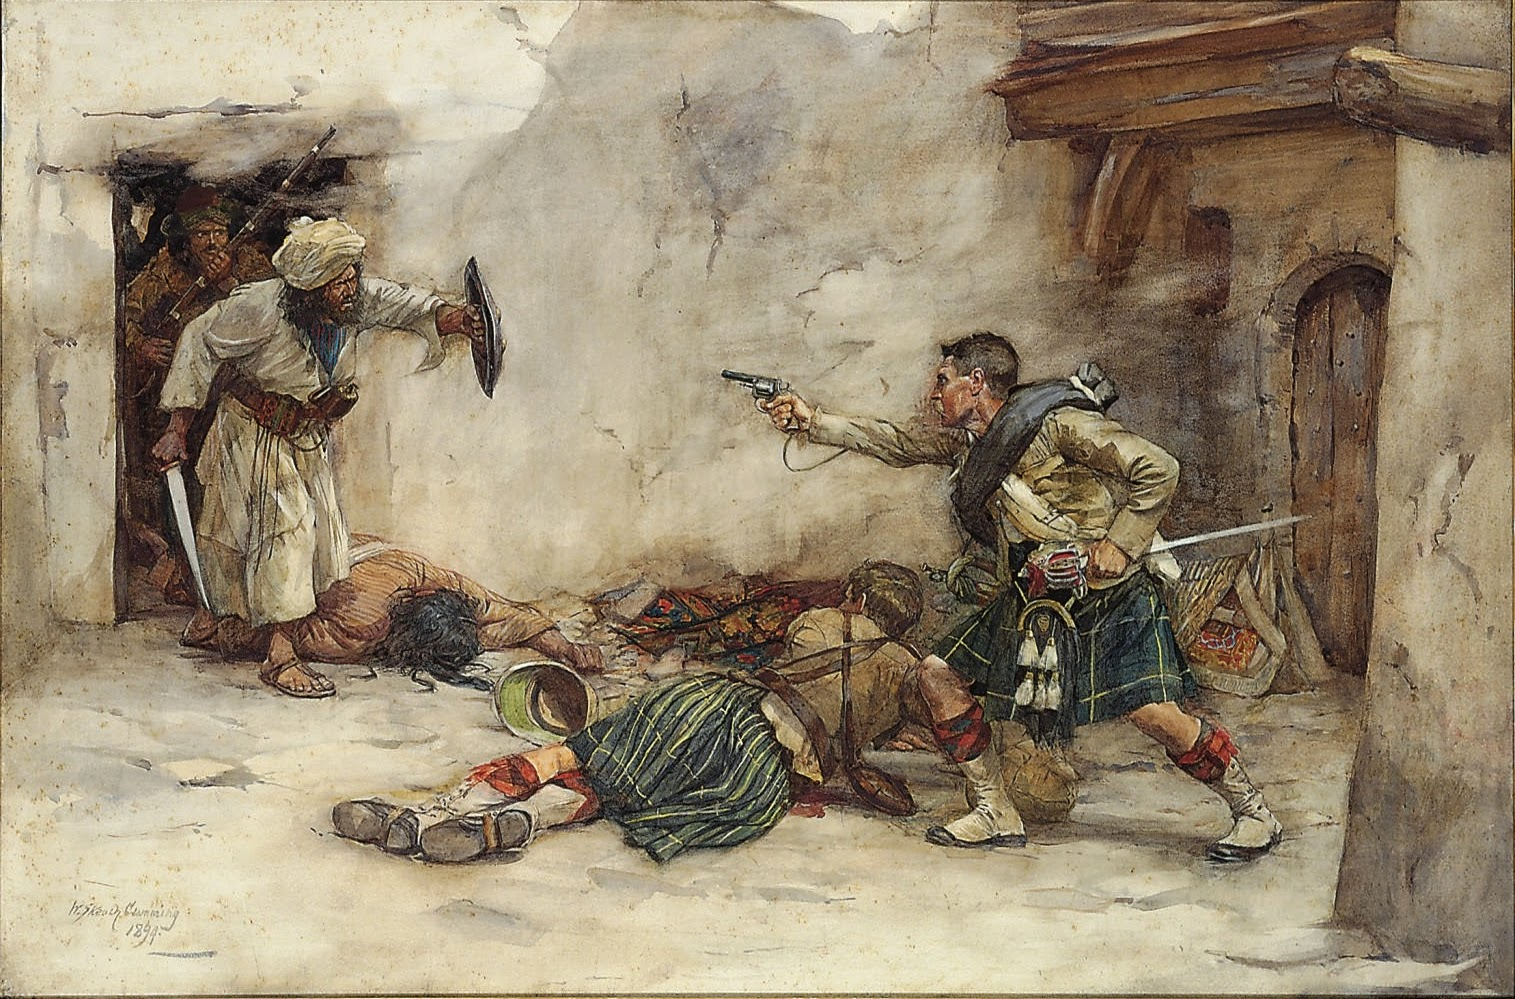 William Skeoch Cumming - Drummer James Roddick of the 92nd Gordon Highlanders Defending Lieutenant Menzies during hand-to-hand fighting in the Battle of Kandahar, 1880.